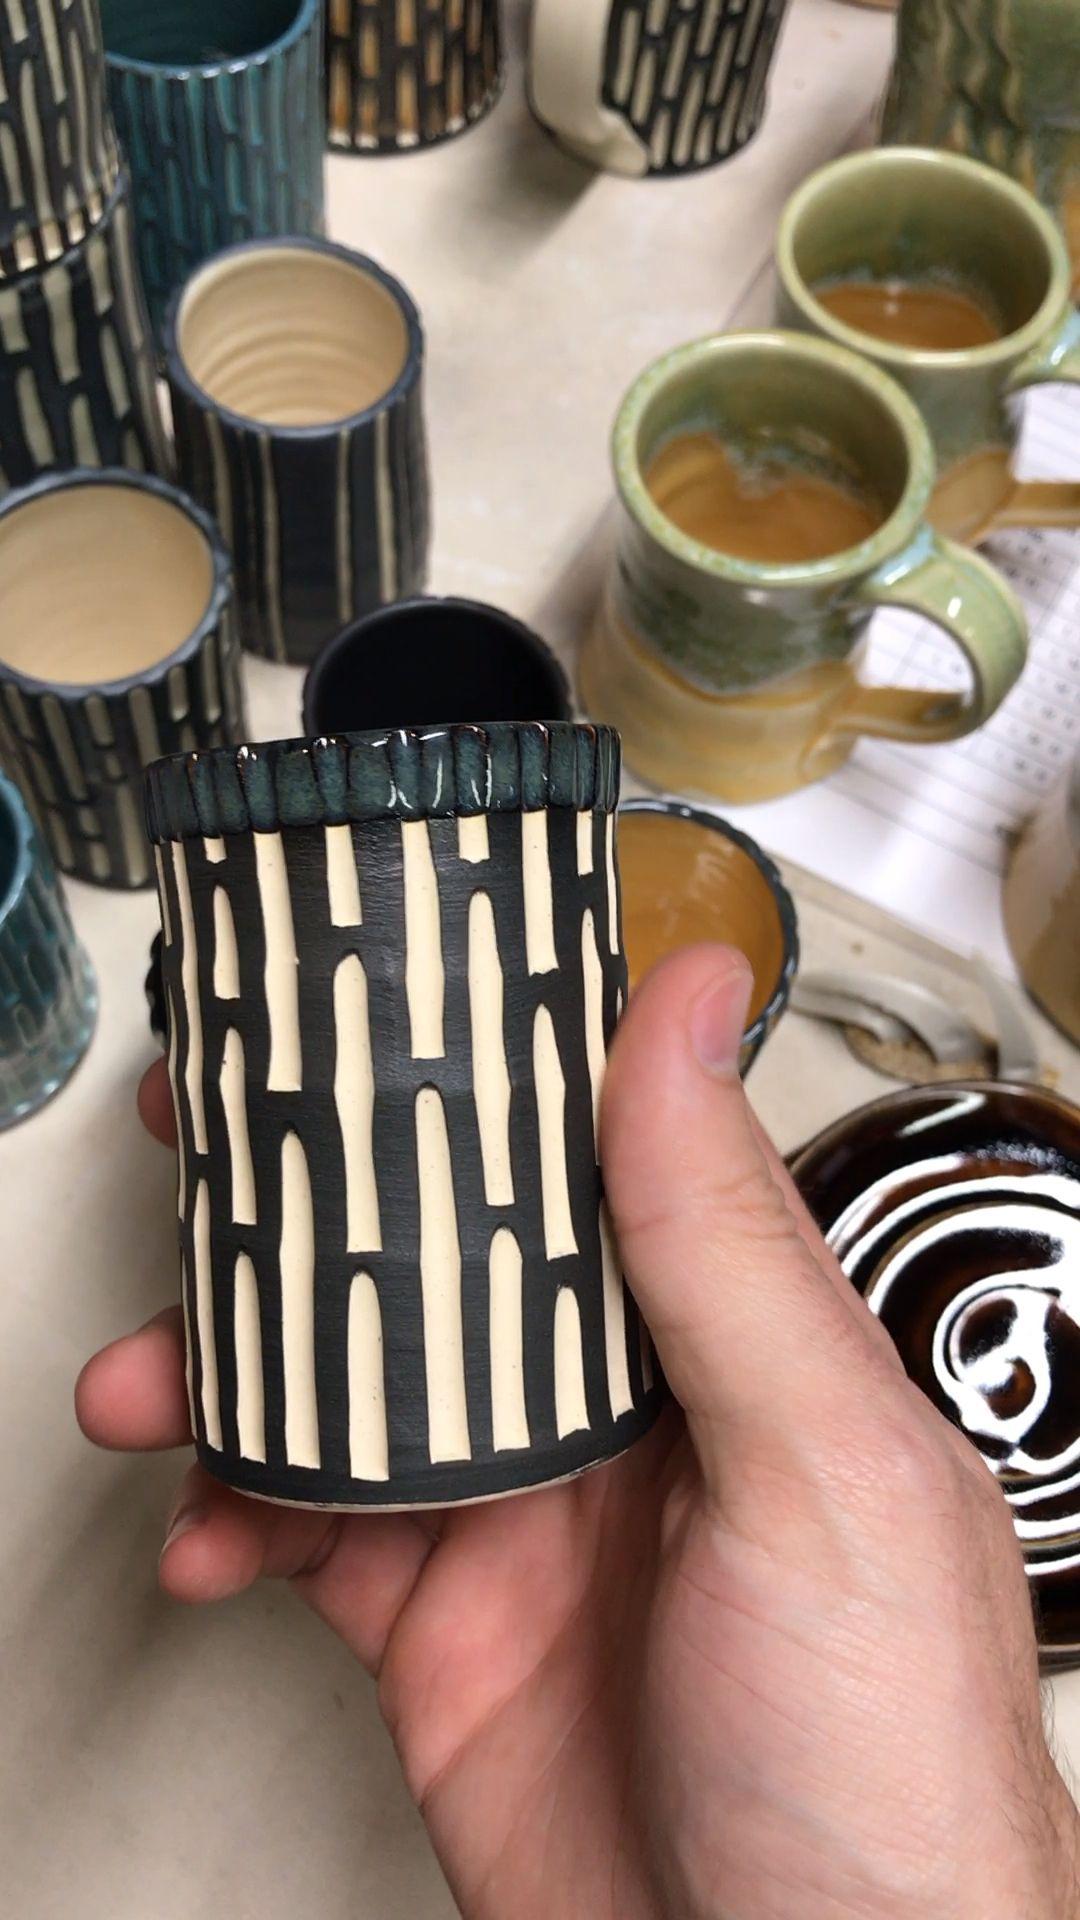 New Carved Ceramic Cups Rd Ceramics Video Ceramic Glaze Recipes Pottery Handbuilding Ceramics Pottery Vase